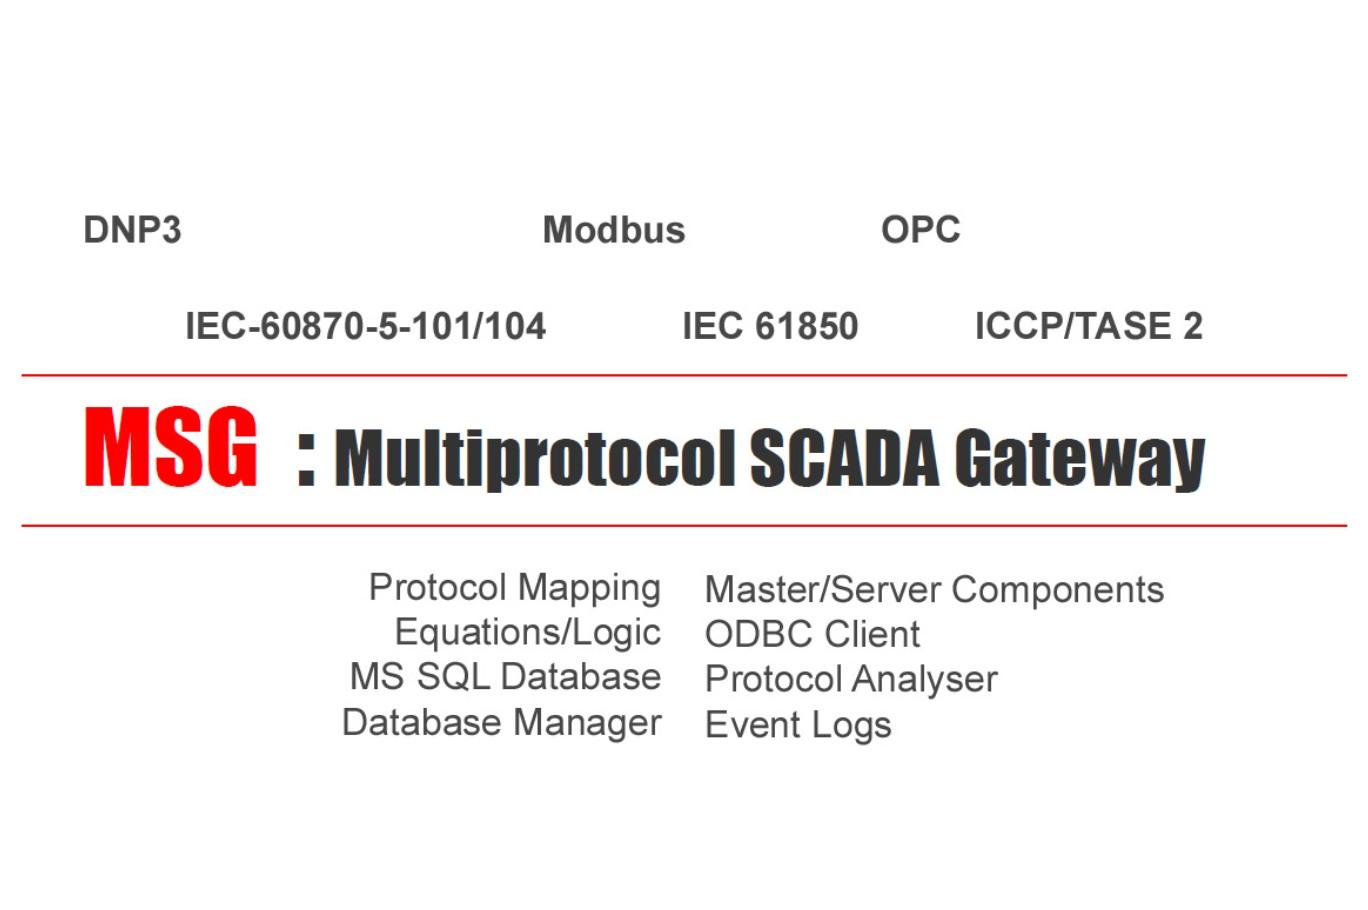 MSG - Multiprotocol SCADA Gateway | Sigfox Partner Network